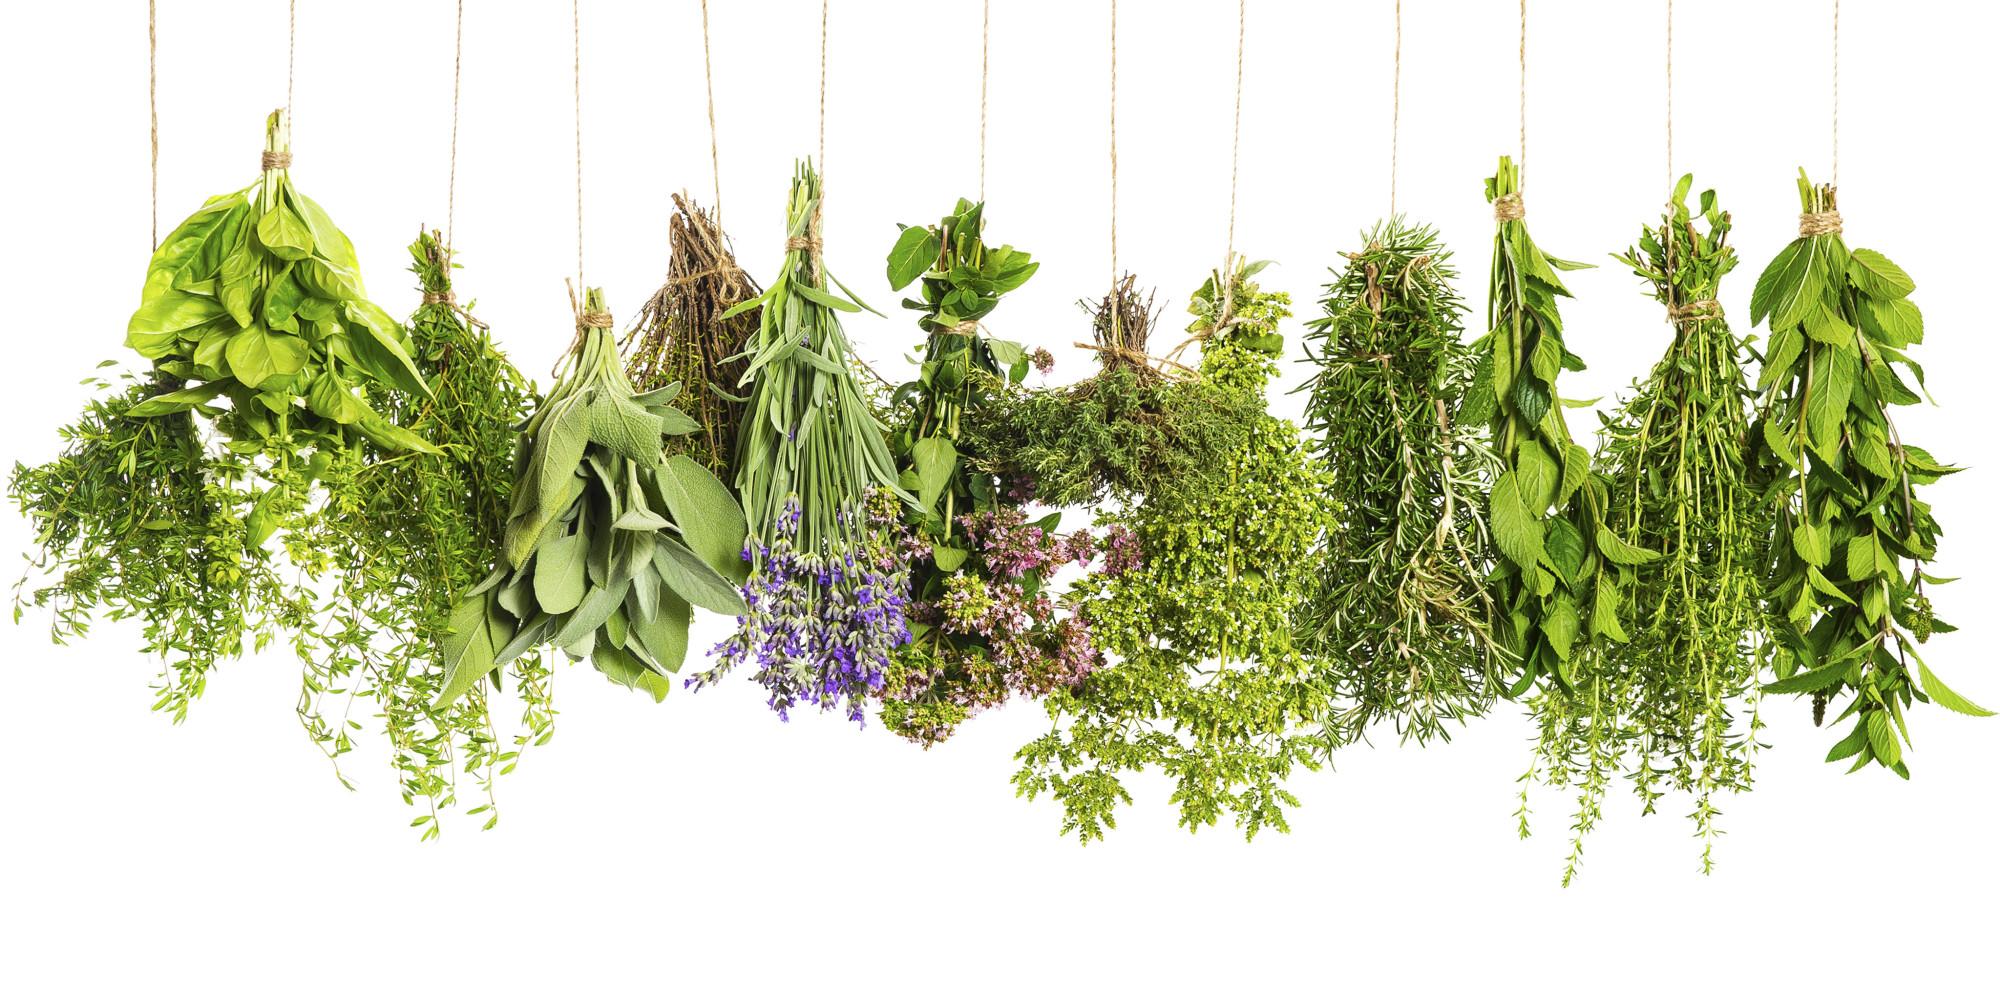 satvik food veggies herbs